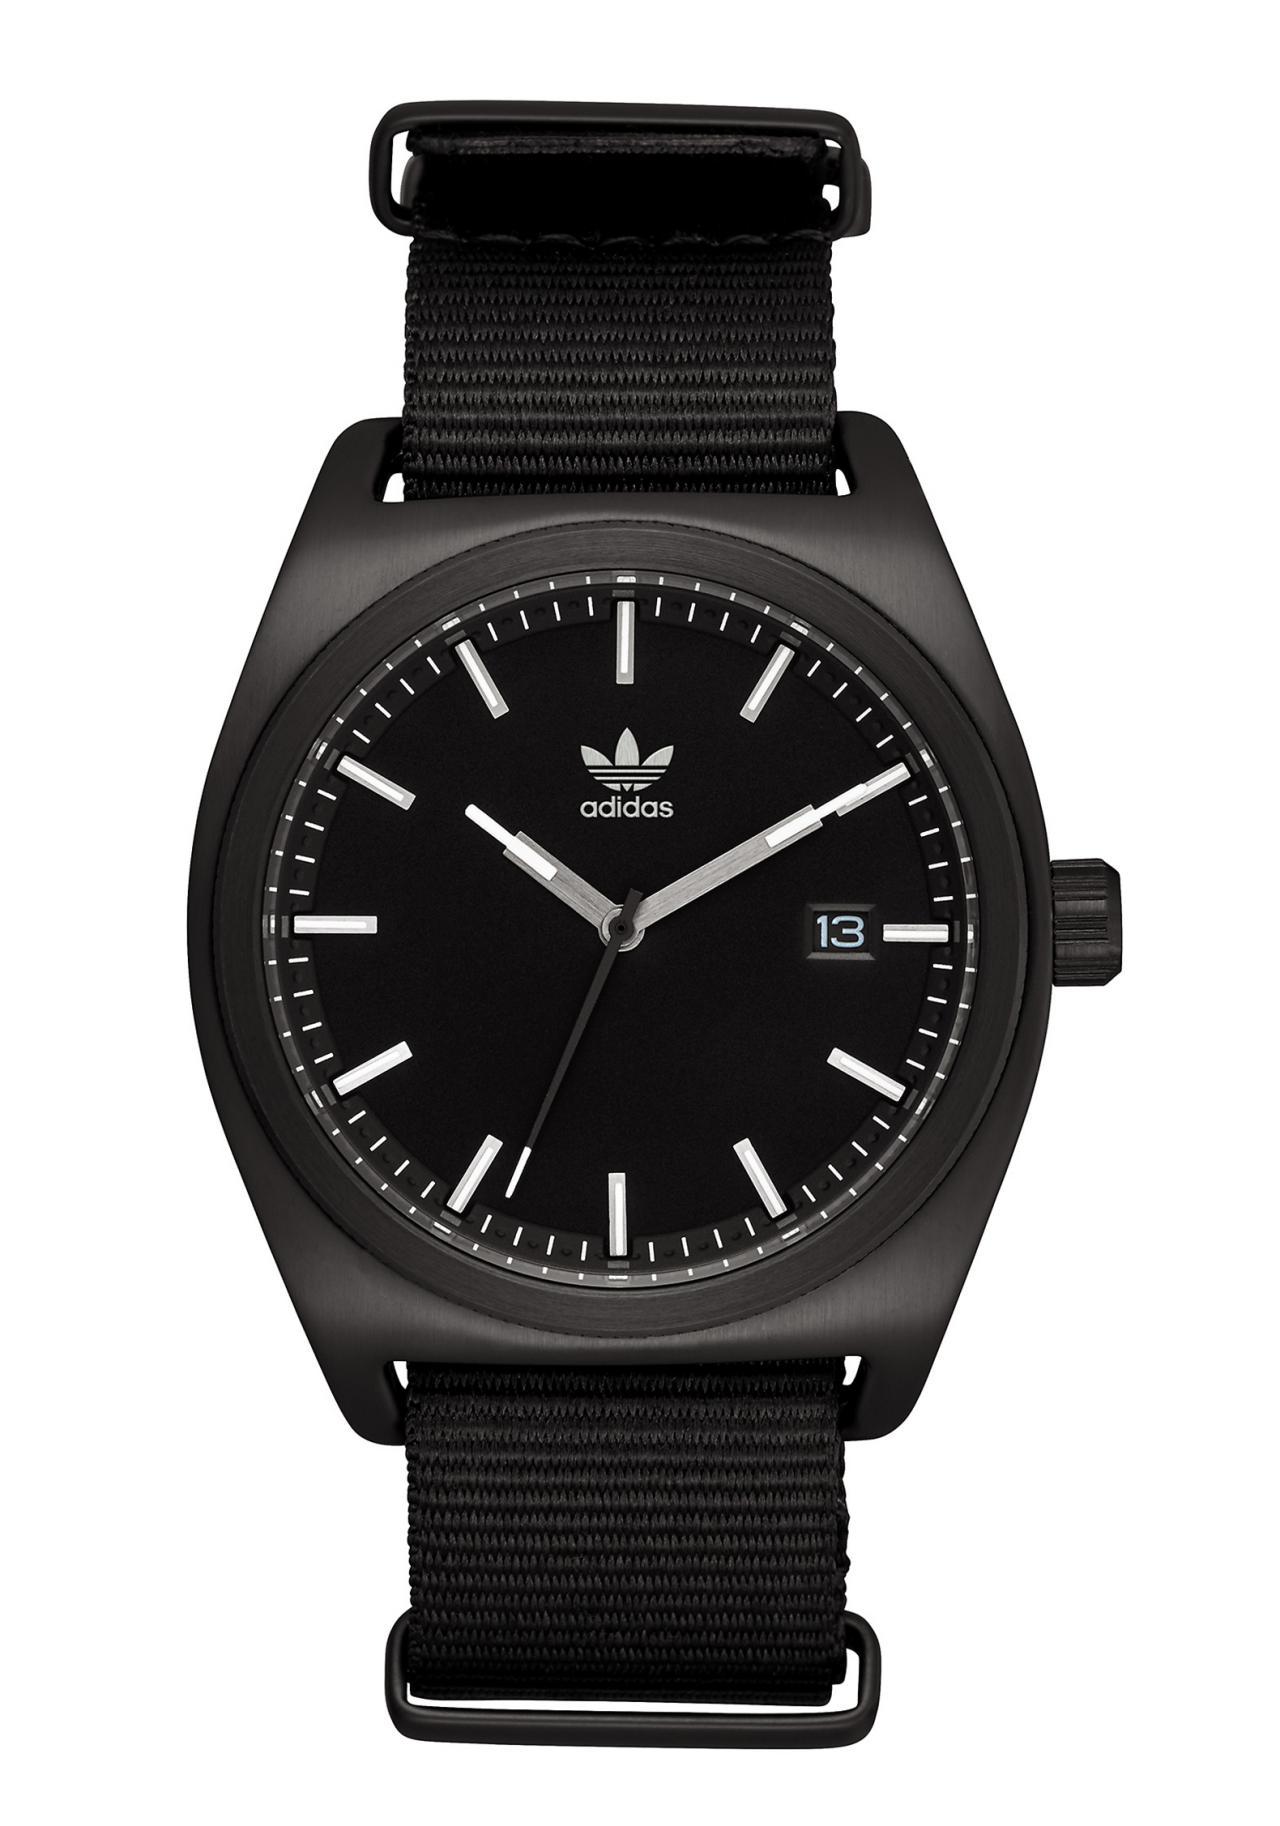 Adidas Process All Black / Gunmetal Armbanduhr